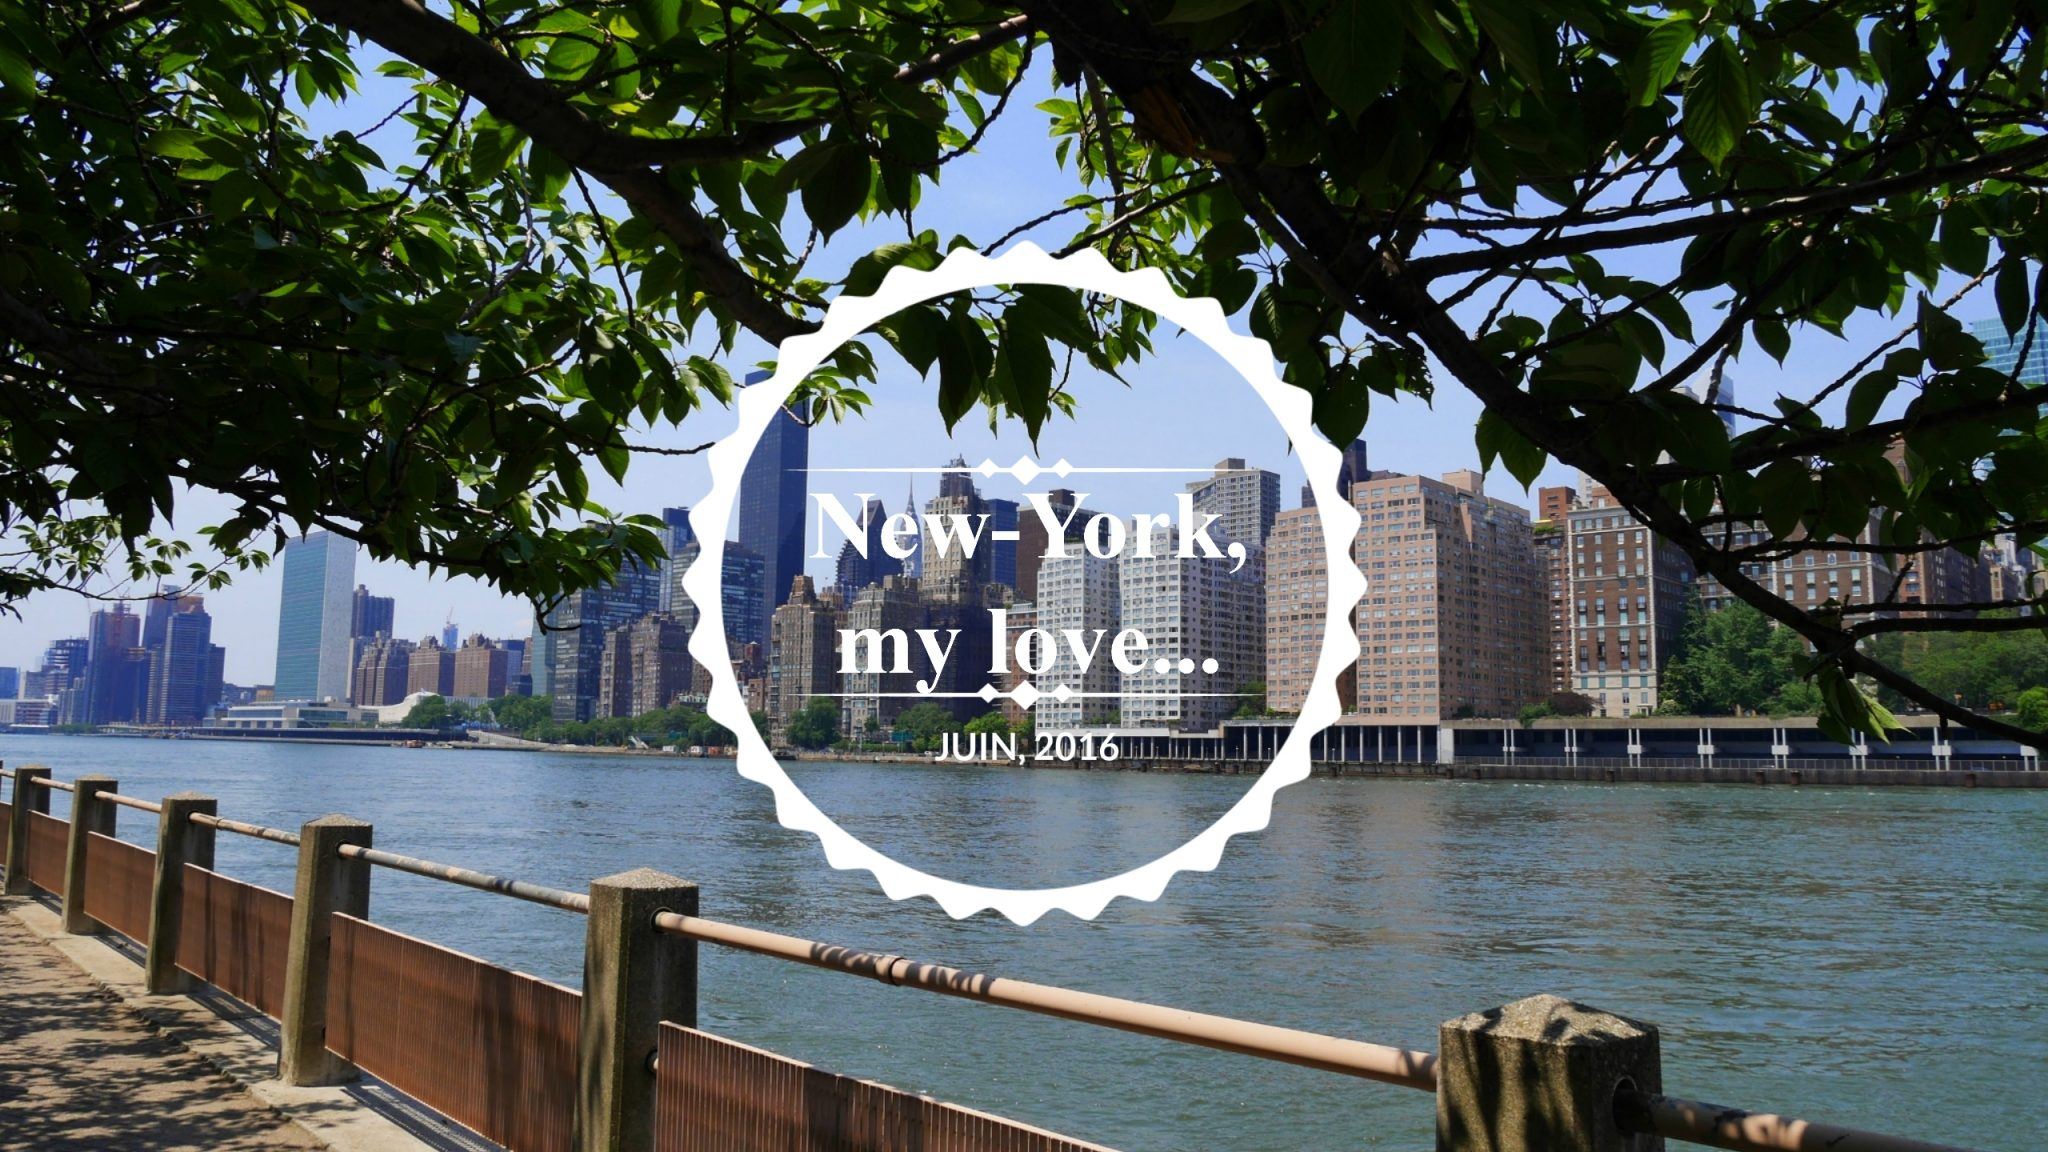 New-York, my love...